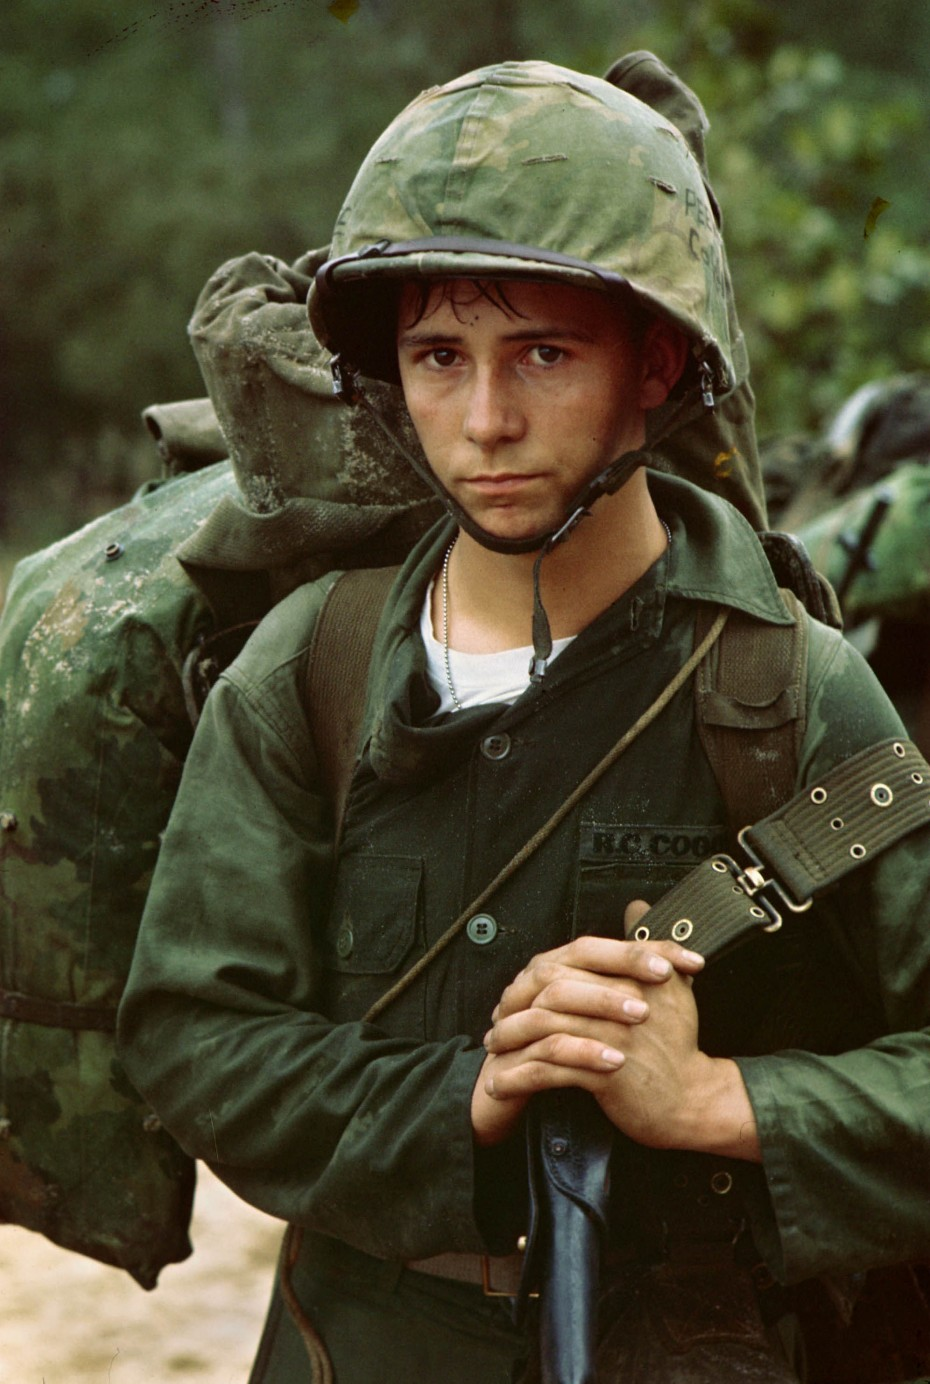 A U.S. Marine landing at Da Nang, Vietnam, 1965.   REUTERS/Courtesy U.S. National Archives - RTX1AW3N